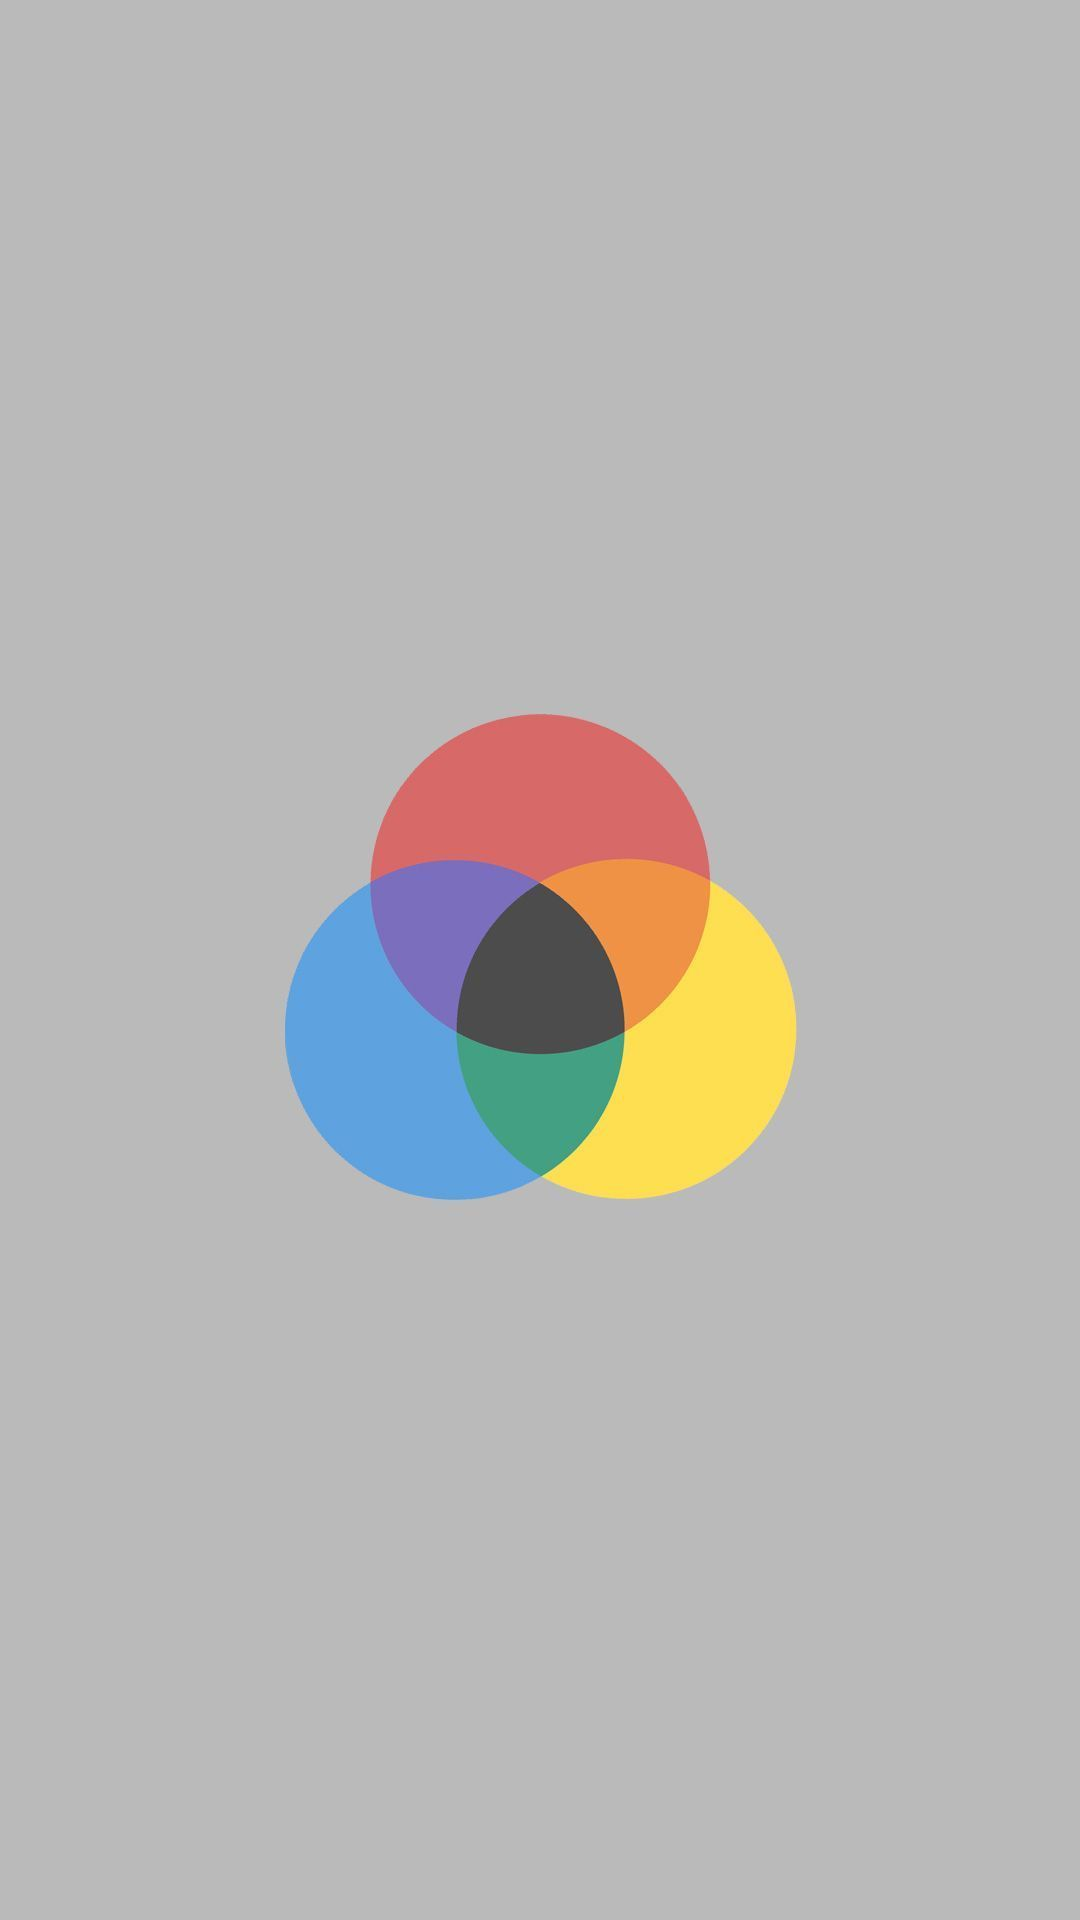 Minimal Color Circles Simple Wallpapers Color Circle Pastel Wallpaper